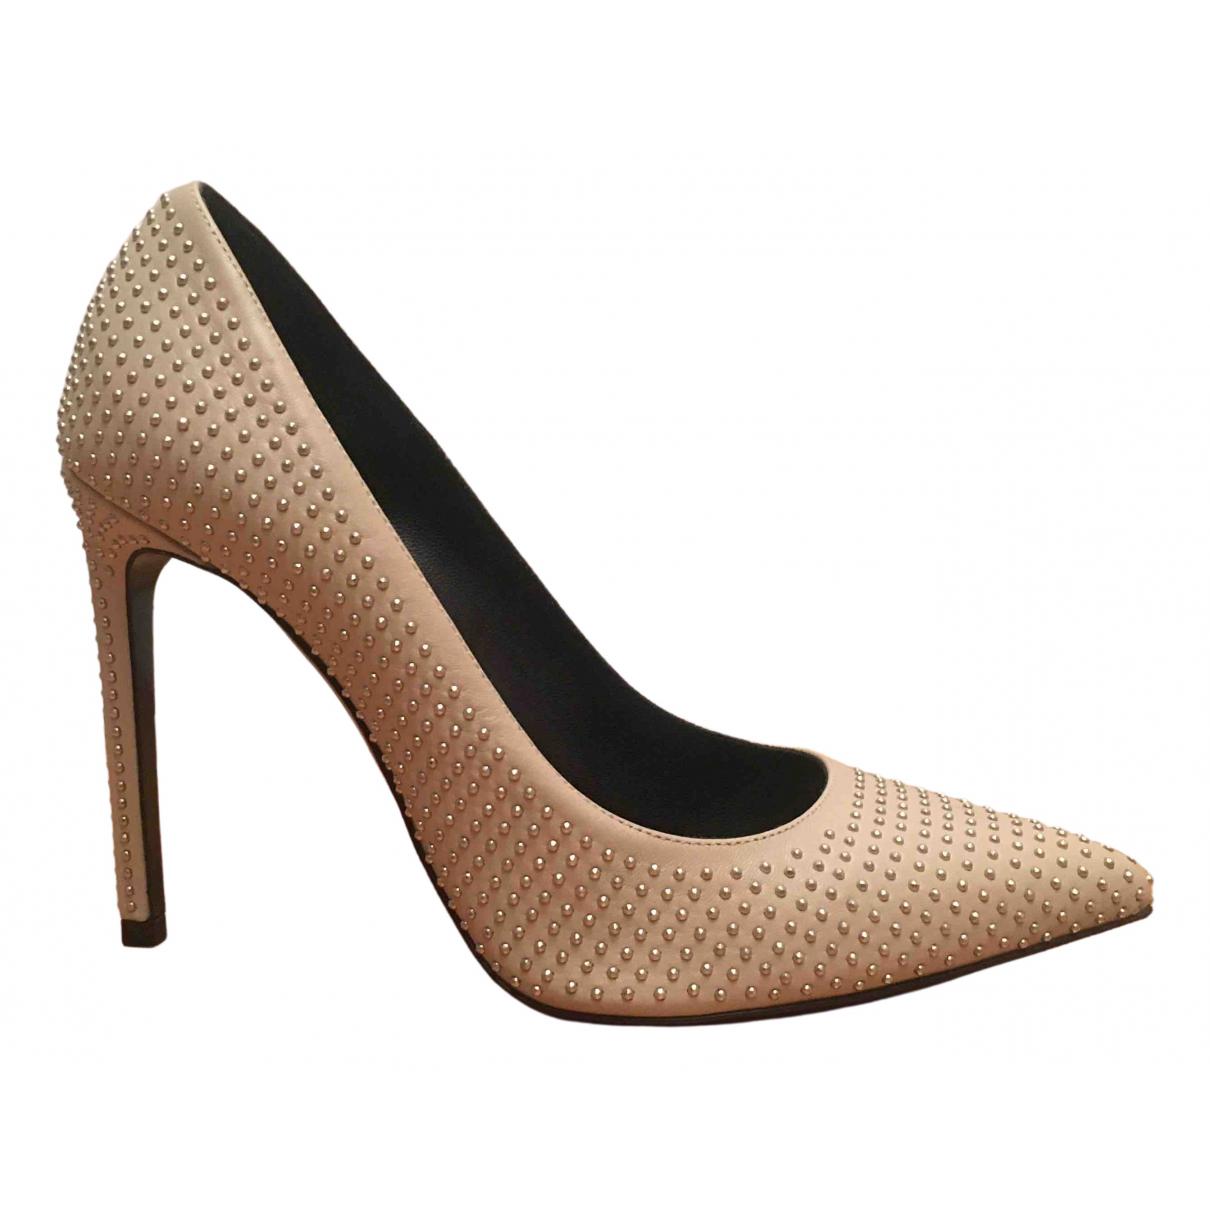 Saint Laurent N Beige Leather Heels for Women 38.5 IT